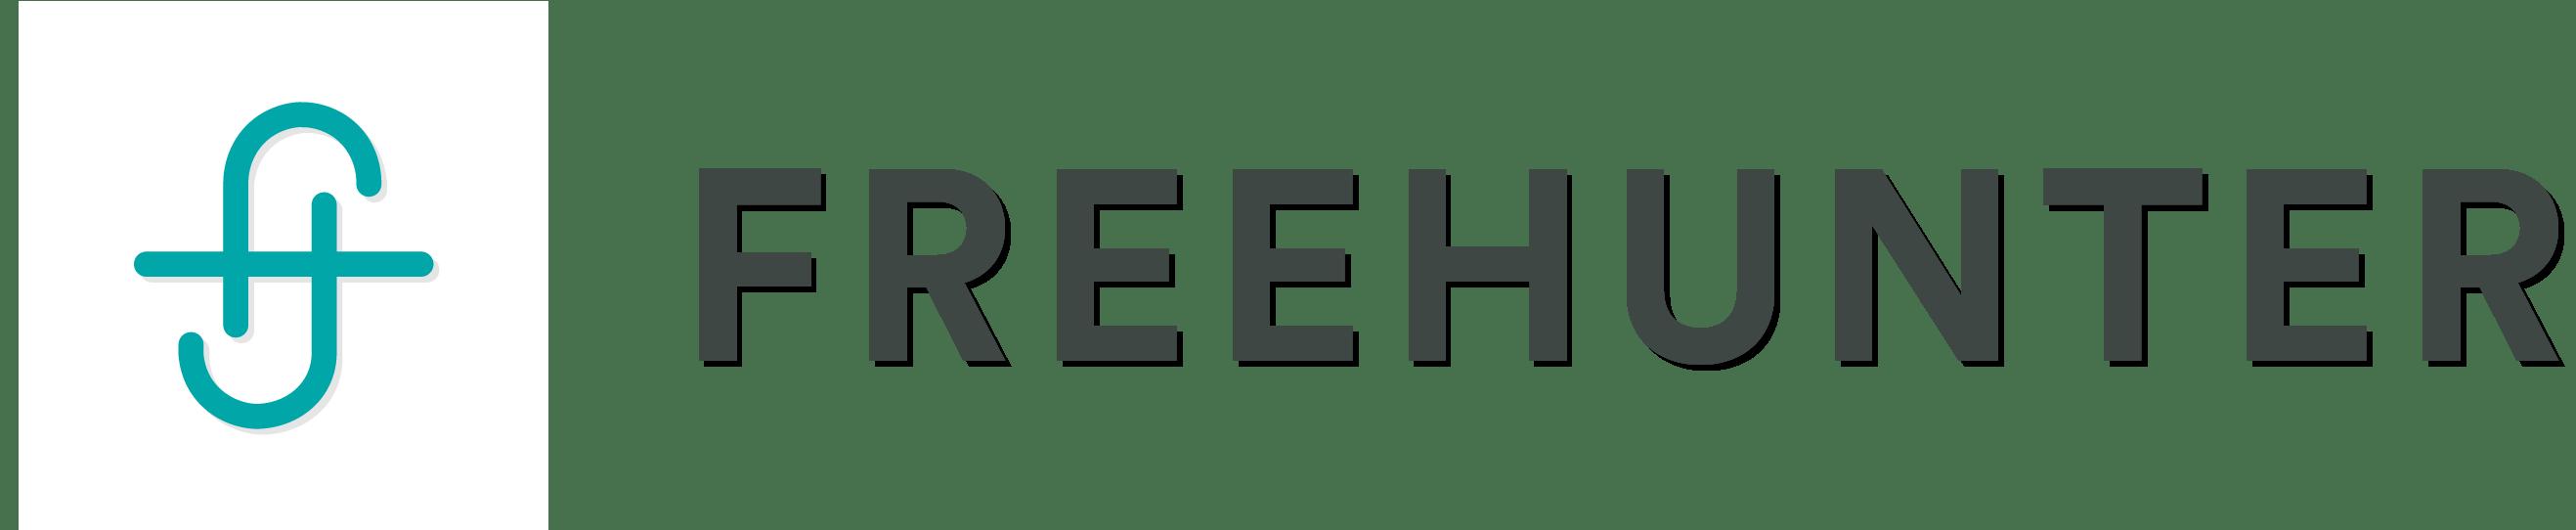 Freehunter - 香港人的Freelance平台